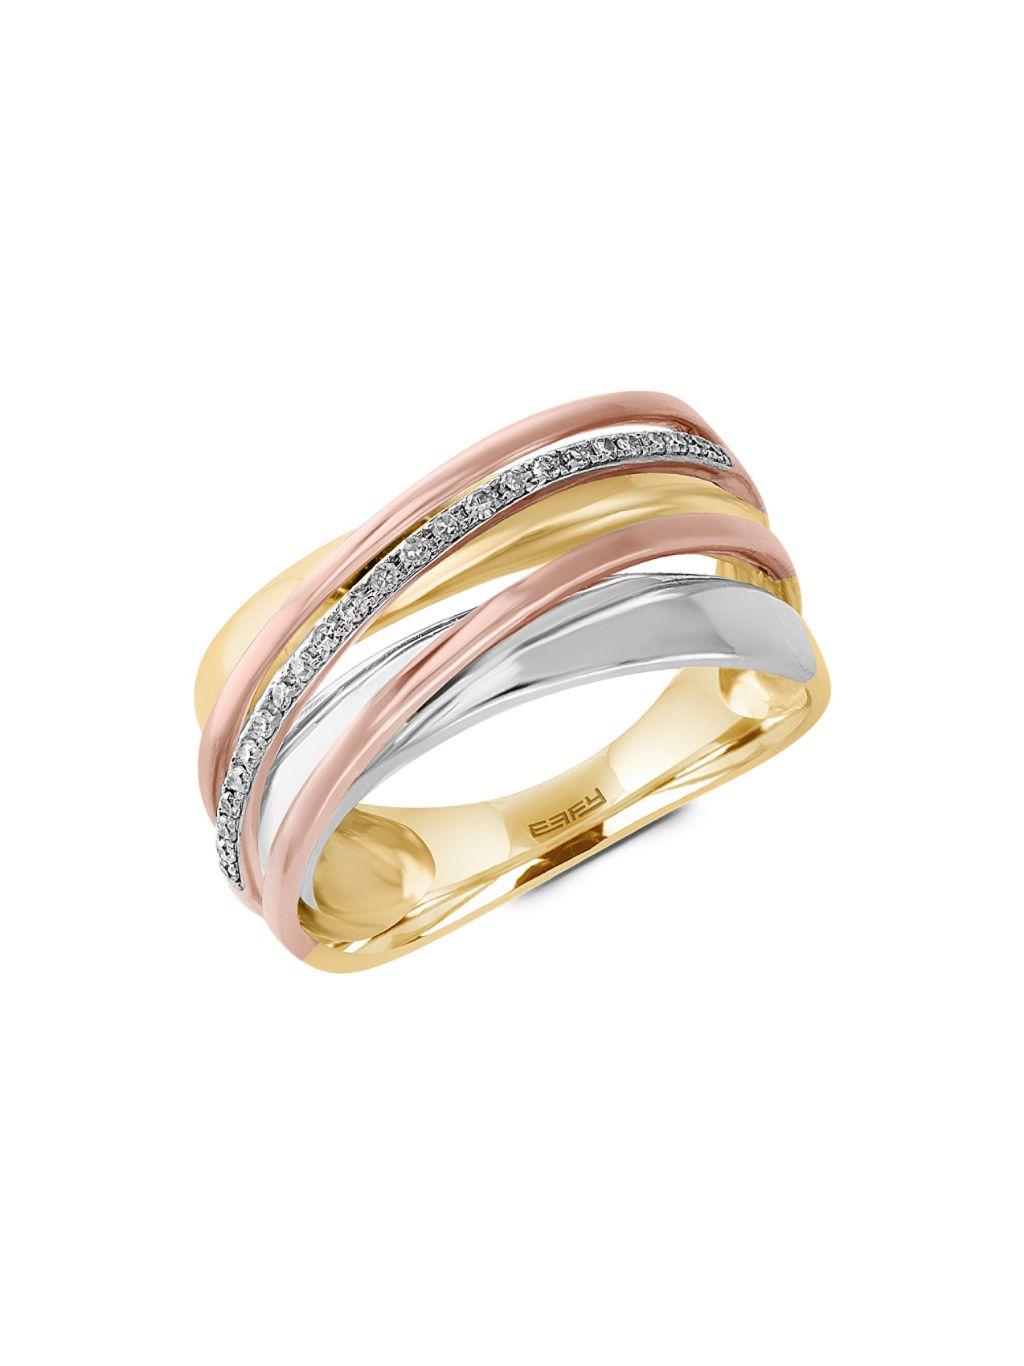 Effy Diamond and 14K Gold Crisscross Ring, 0.11 TCW